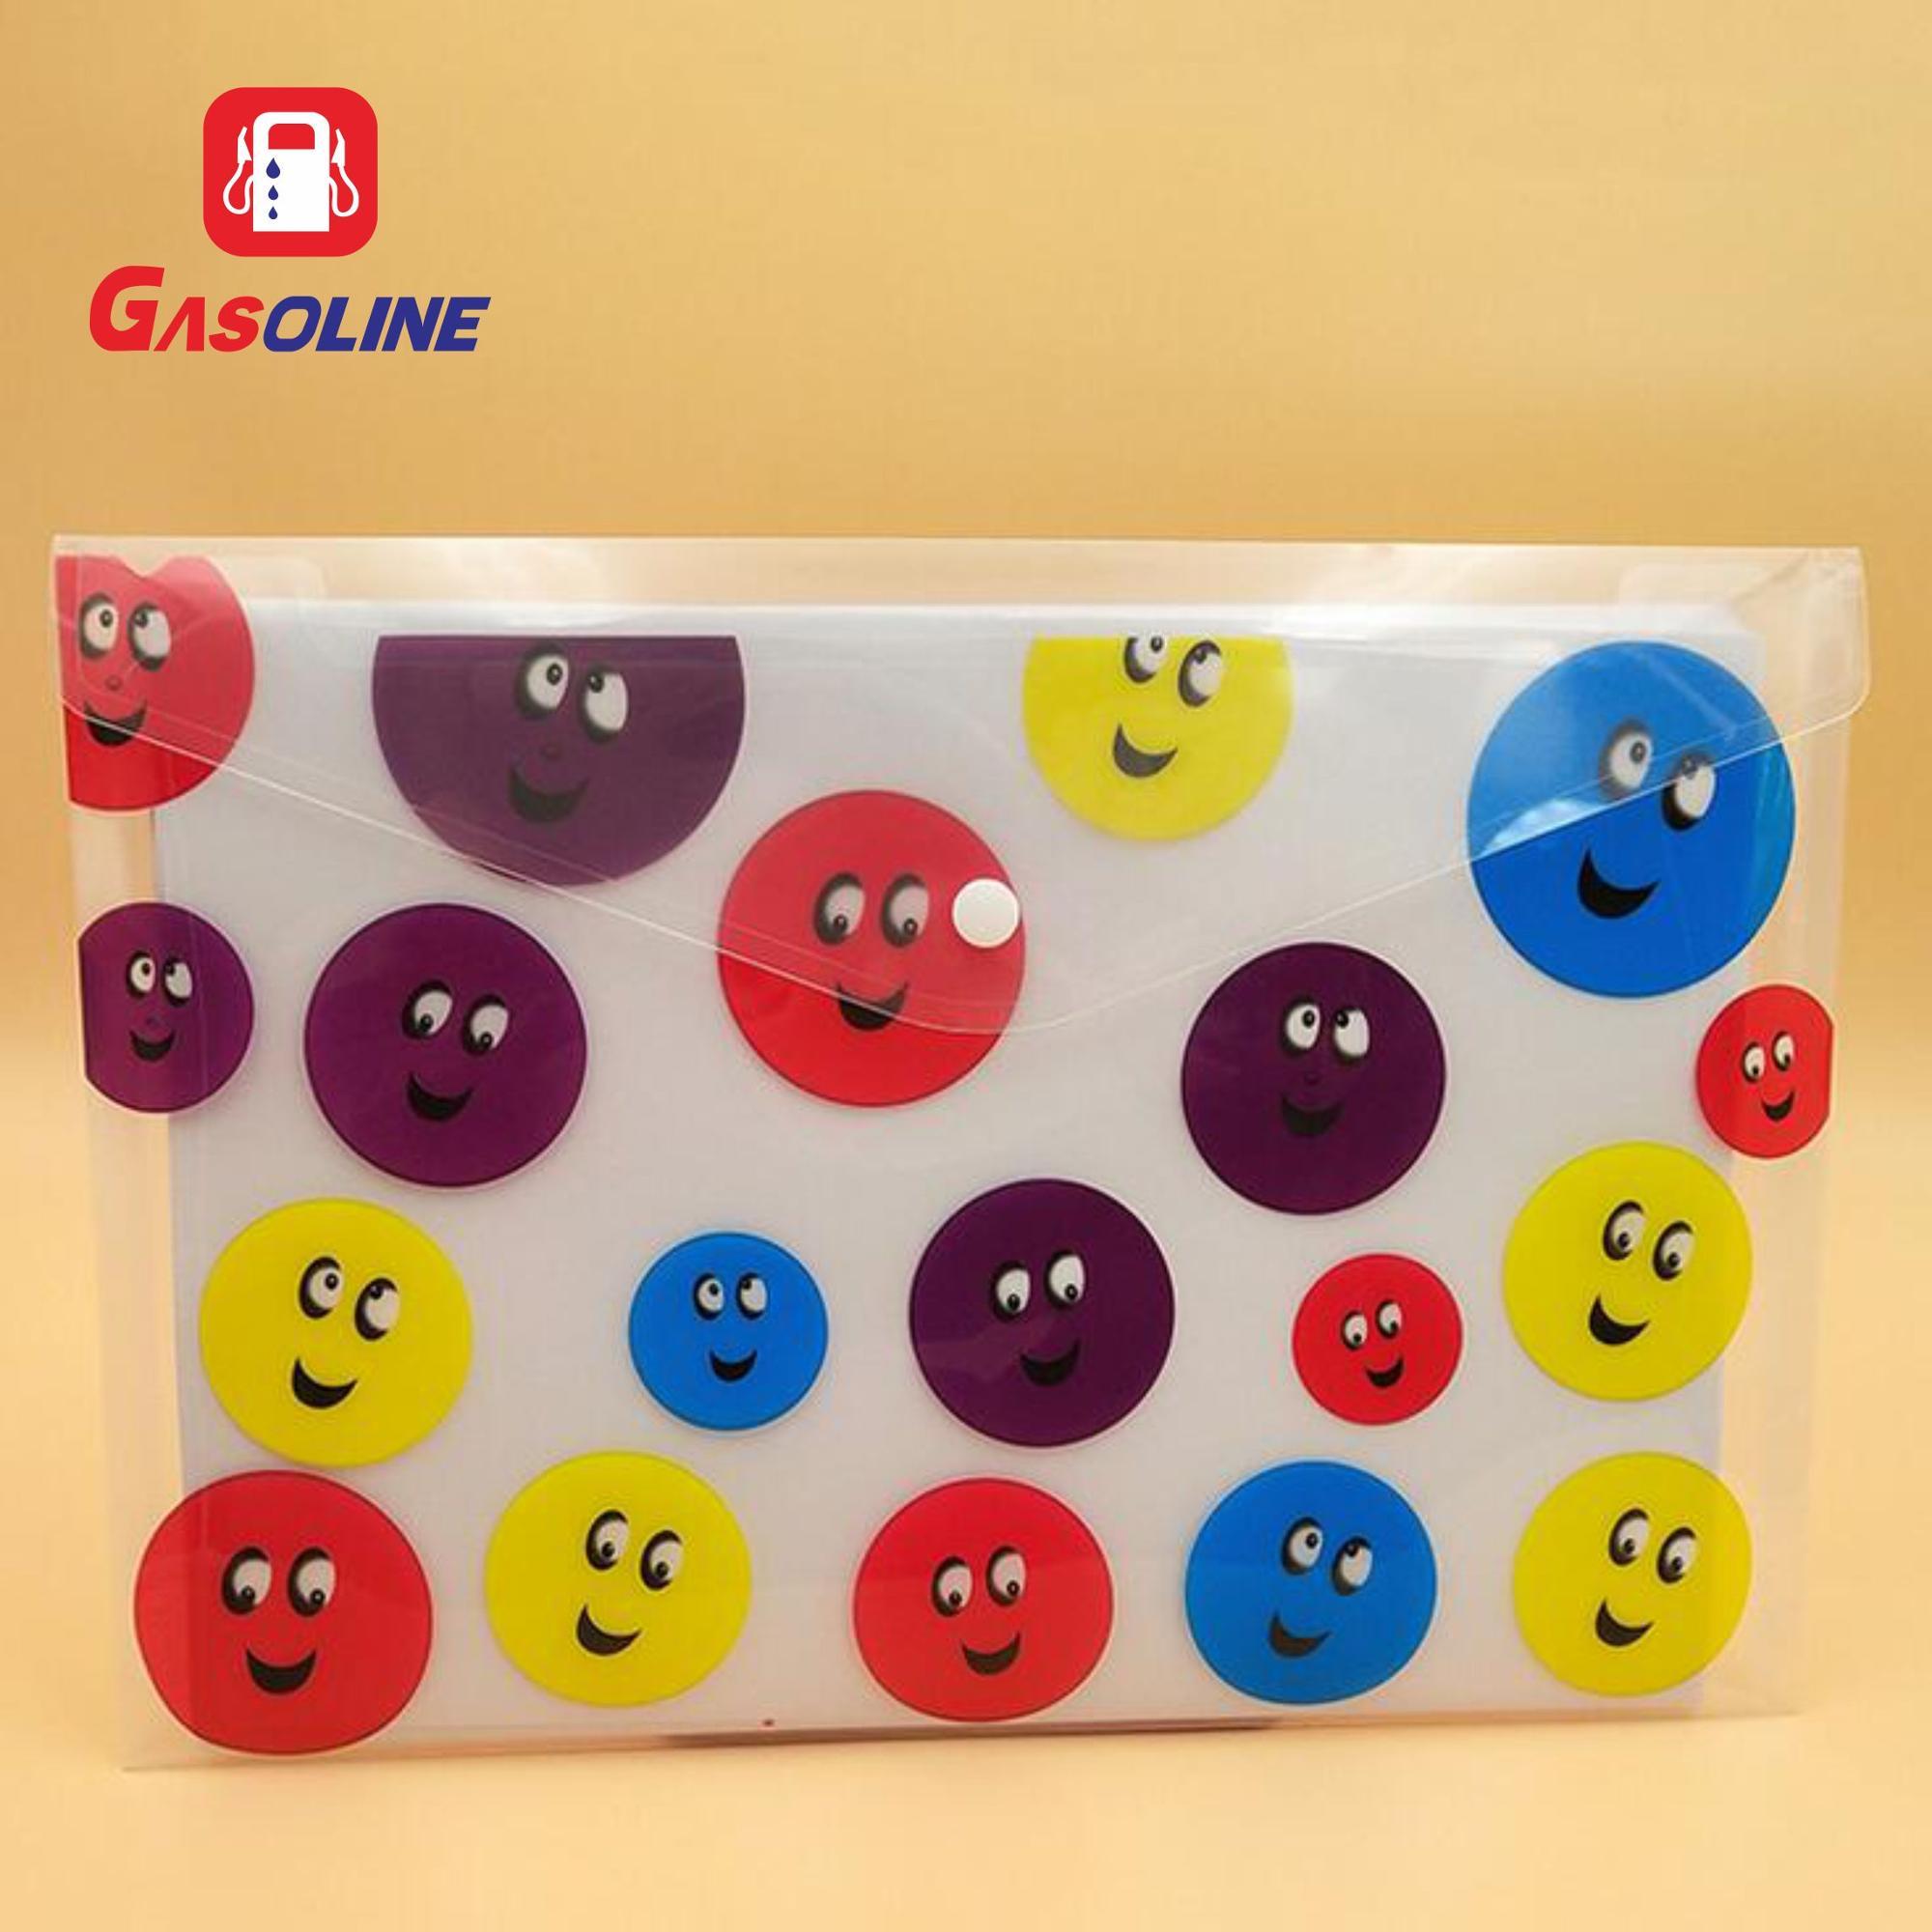 Plastic Hanging Folders Wholesale, Hanging Folders Suppliers - Alibaba